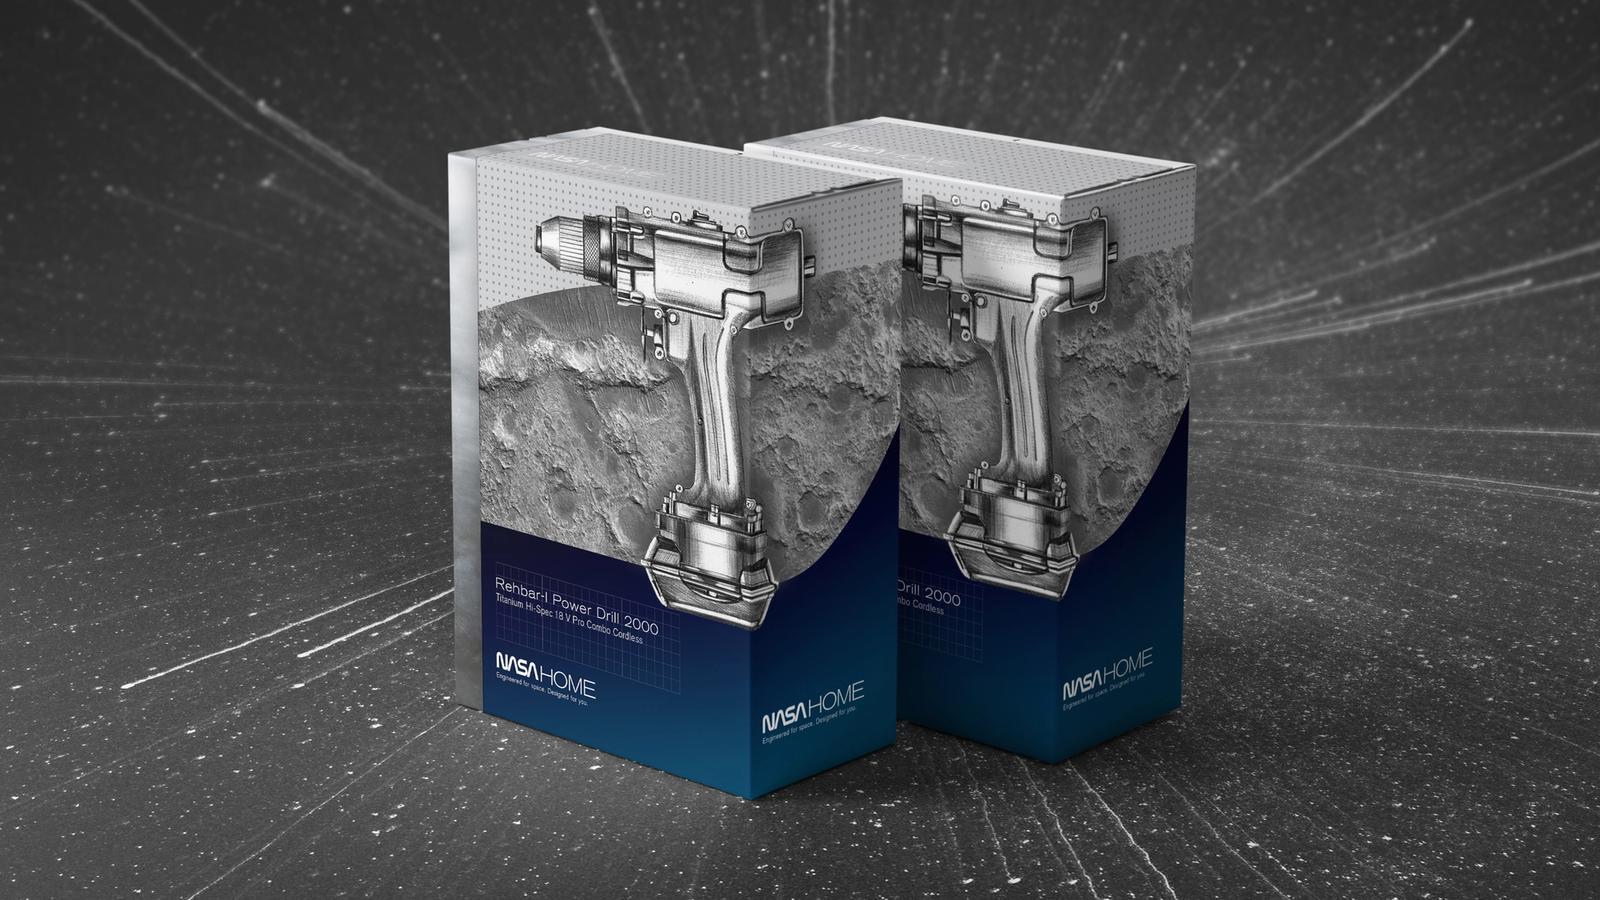 NASA Home product packaging